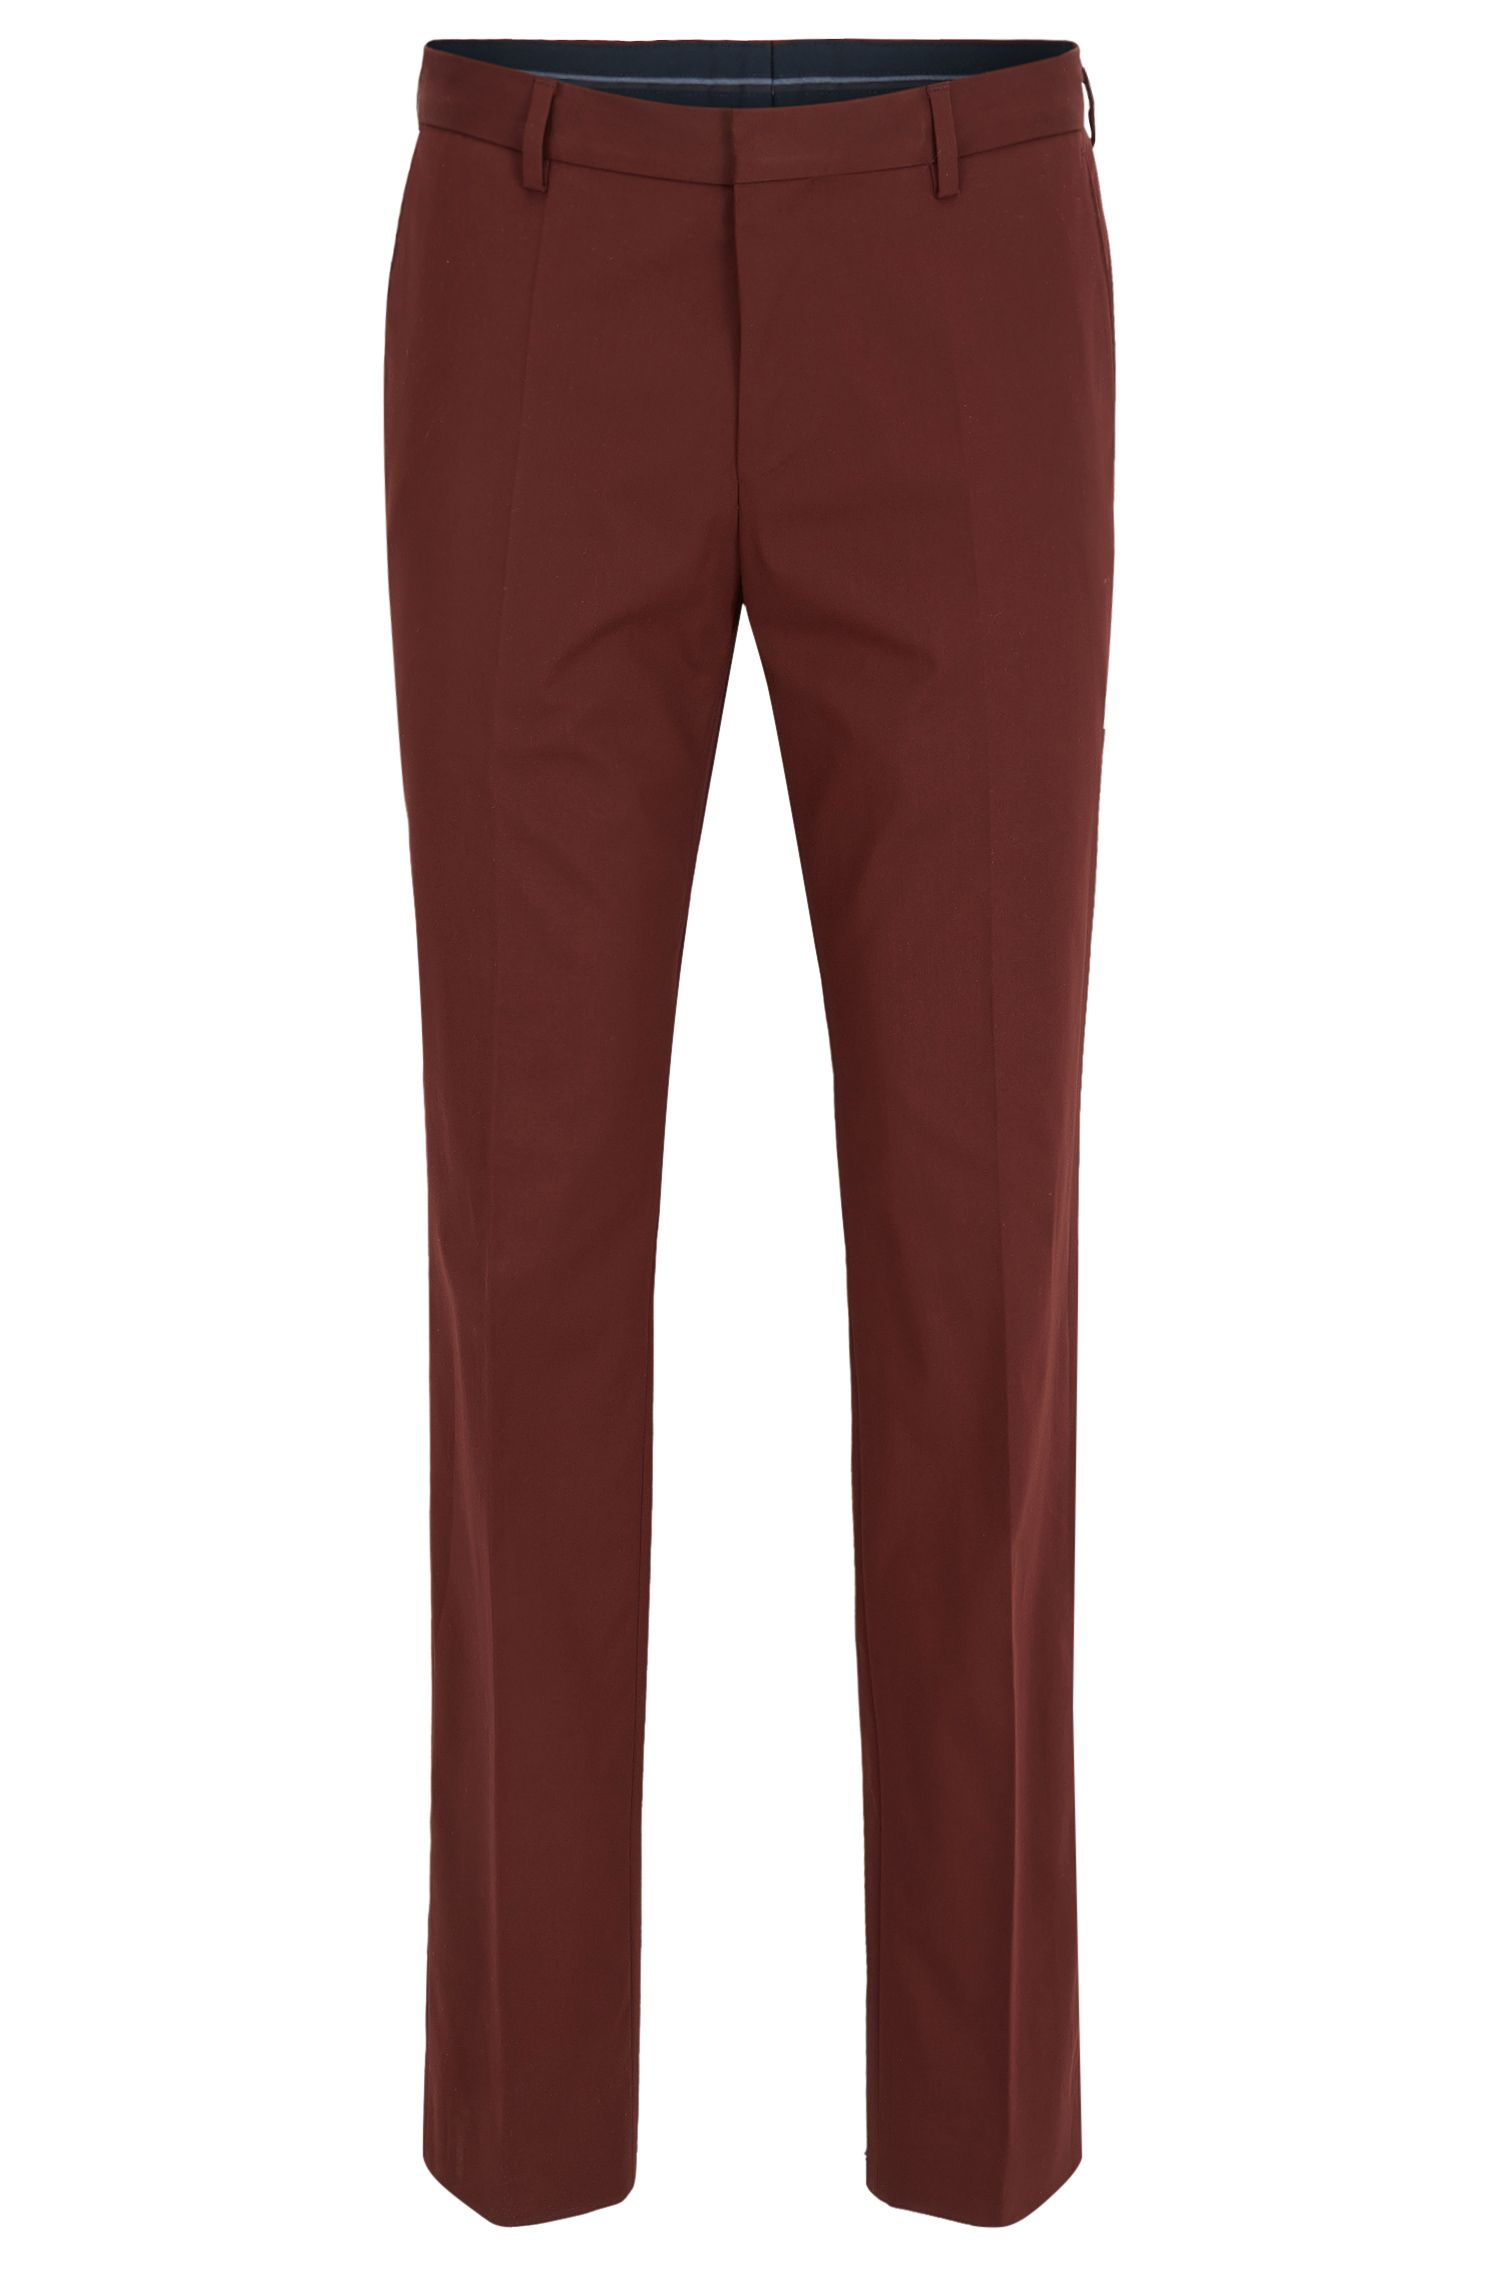 Stretch Cotton Dress Pant, Slim Fit | Genesis